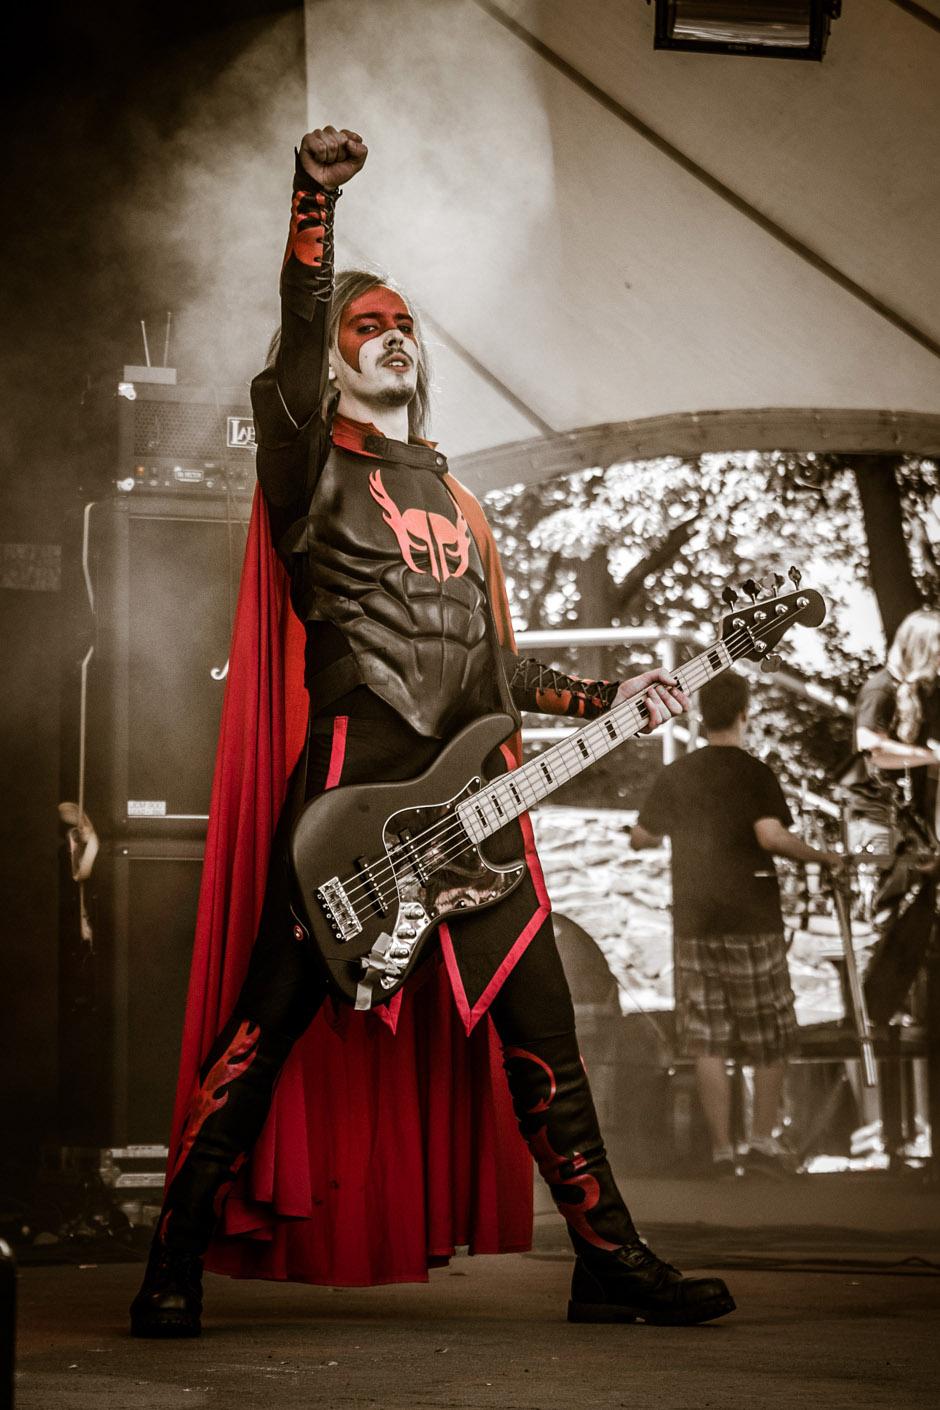 Grailknights live, Metalfest Loreley 2013